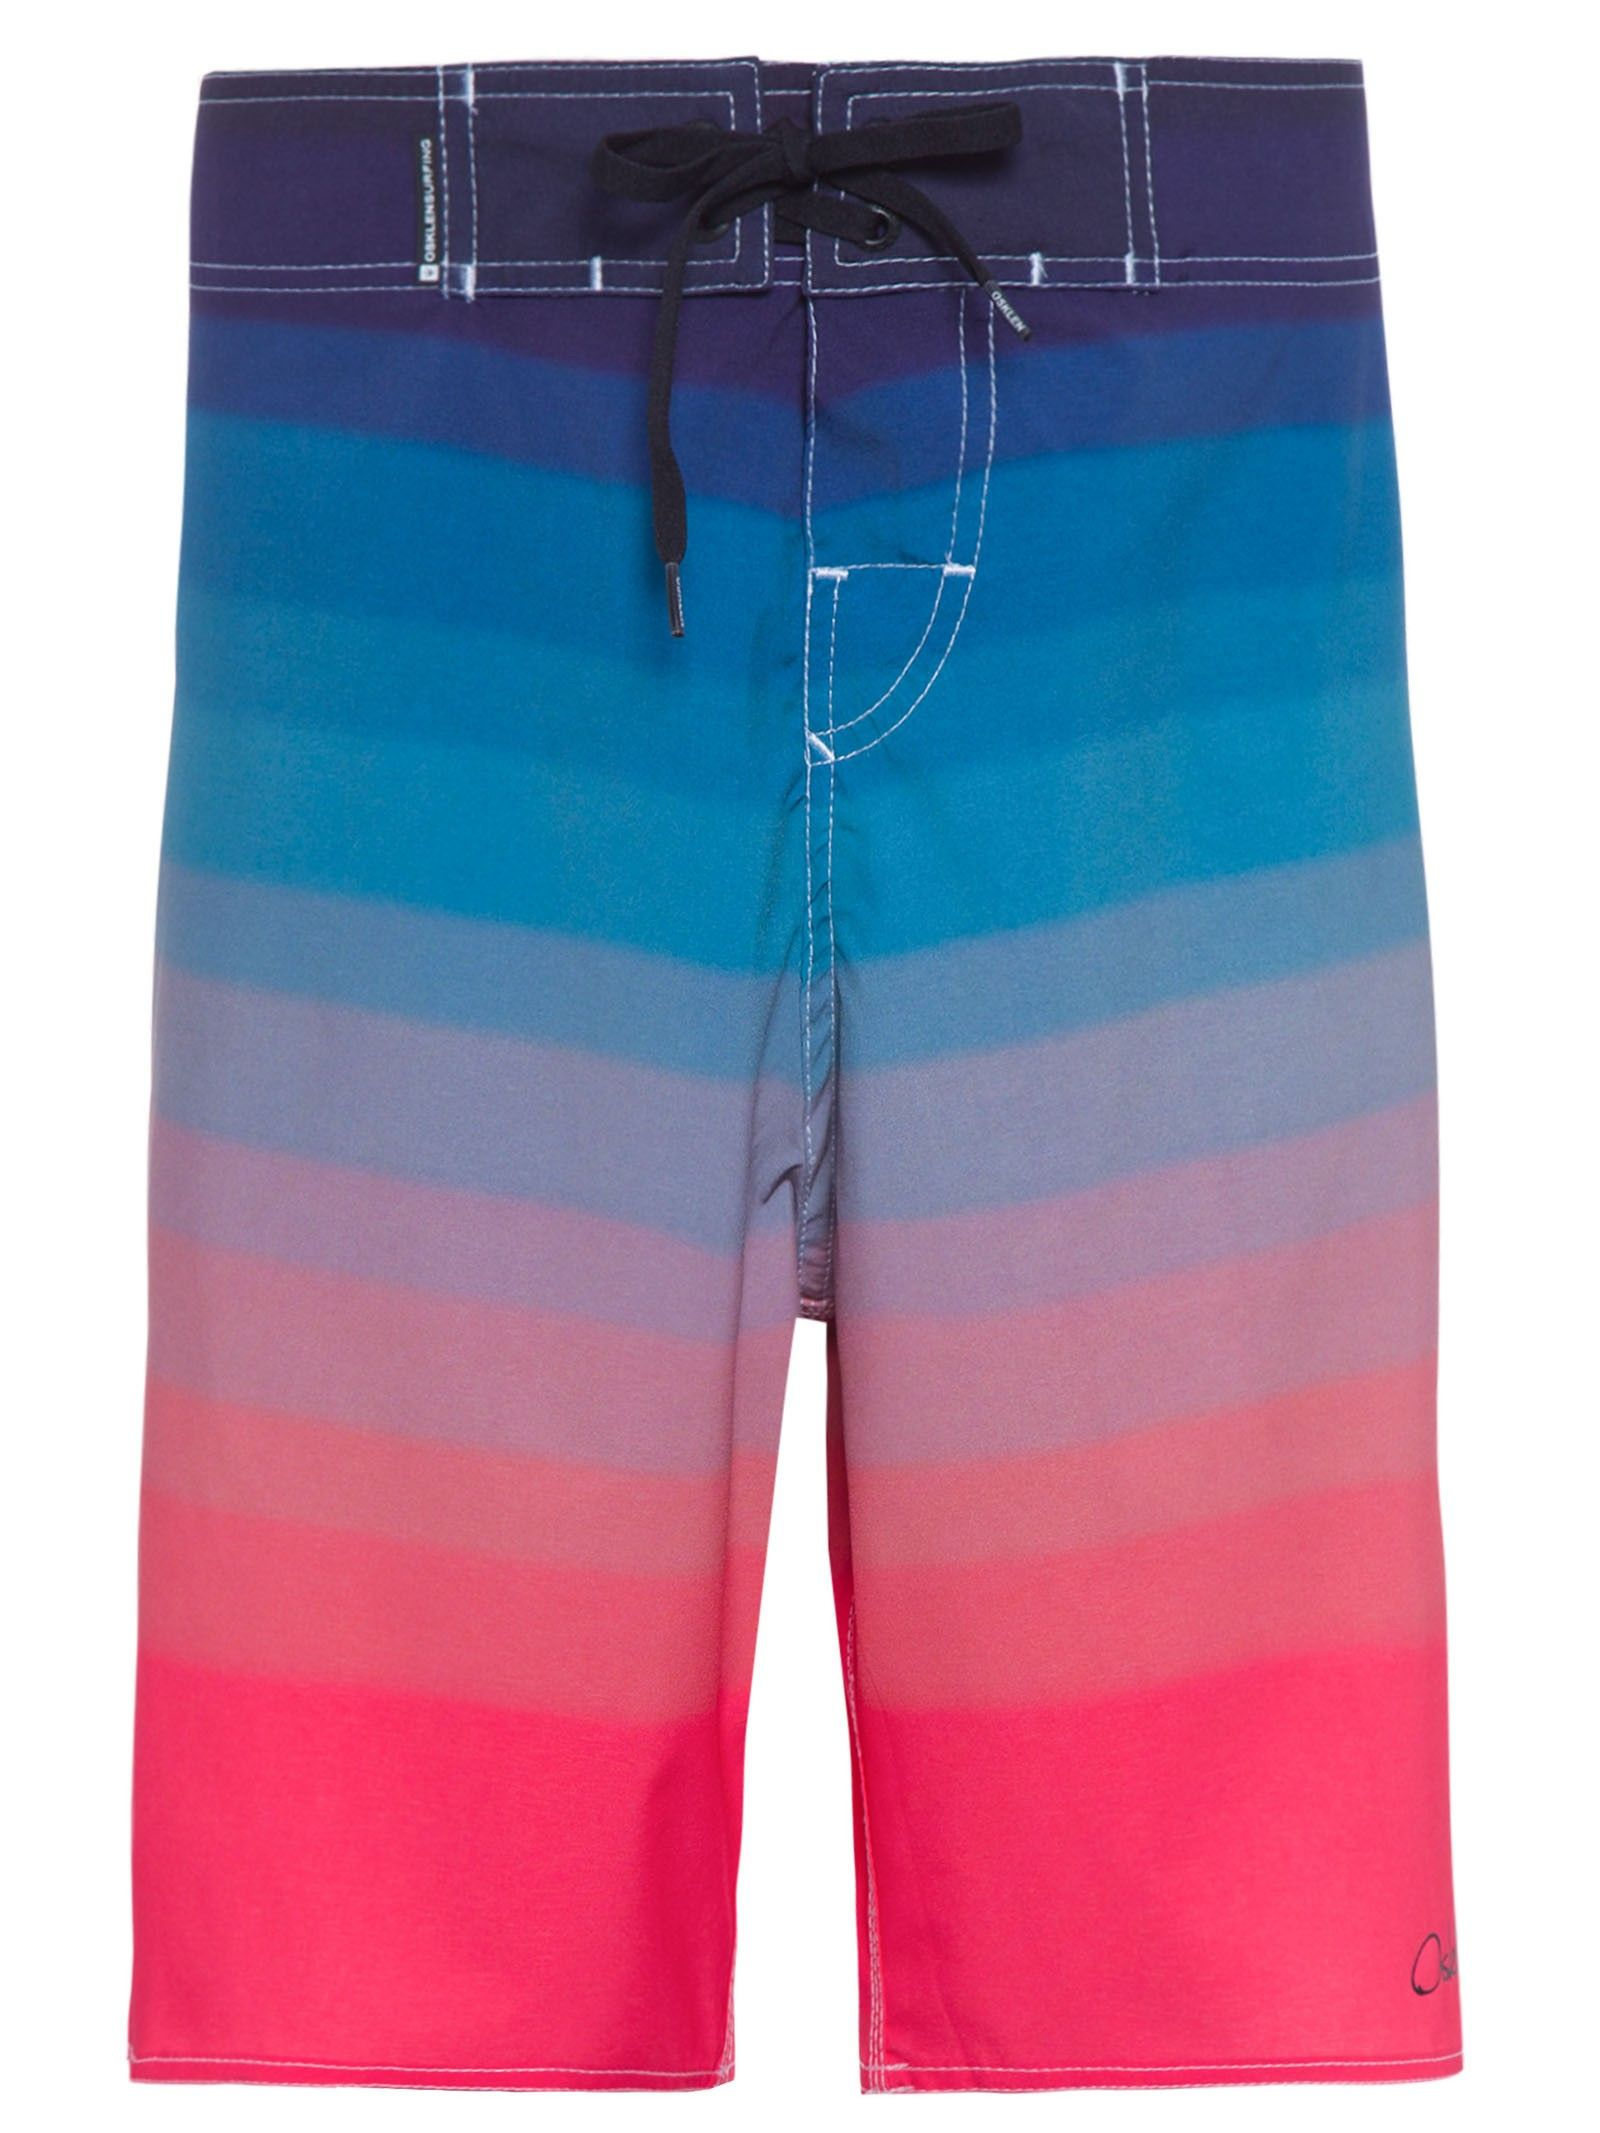 64aa87c903e1c Bermuda Masculina Surf Blur Lines - Osklen - Azul - Shop2gether ...